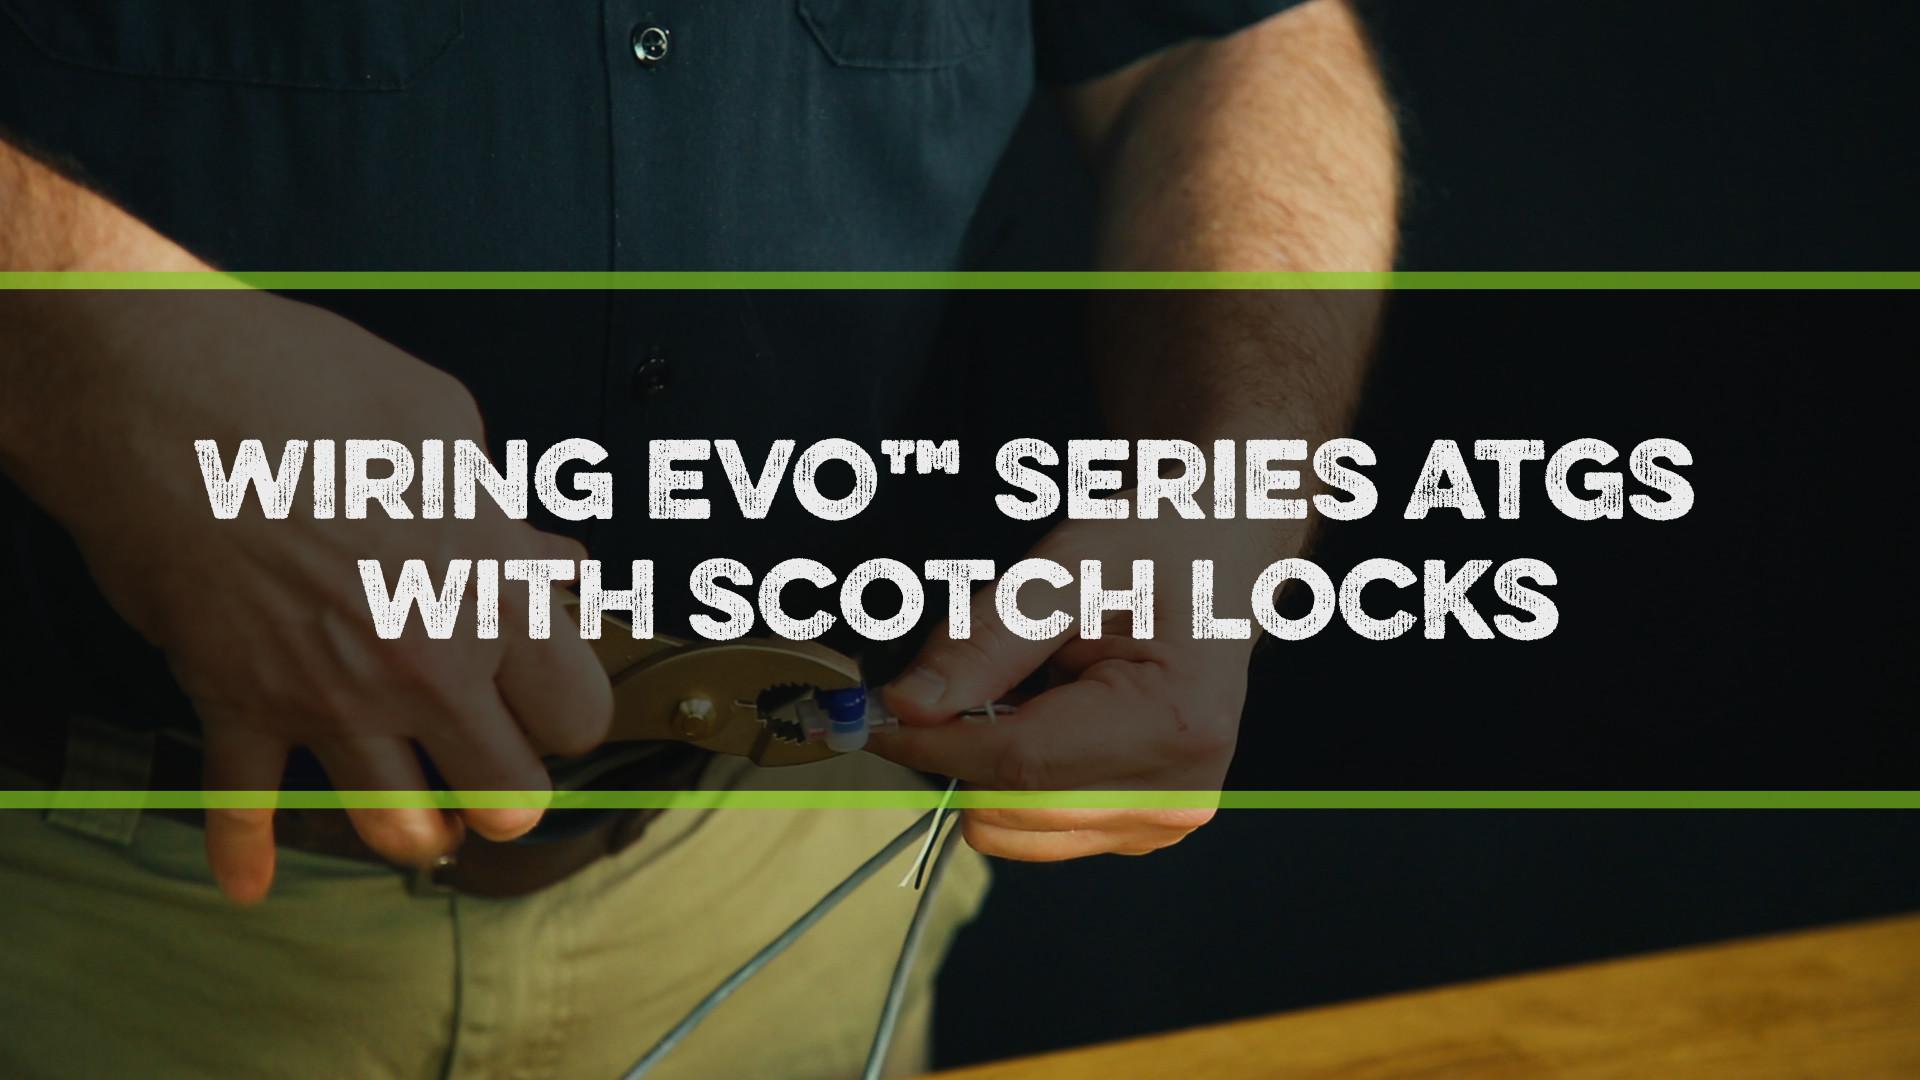 FFS Pro Wiring EVO™ Series ATGs with Scotch Locks Video